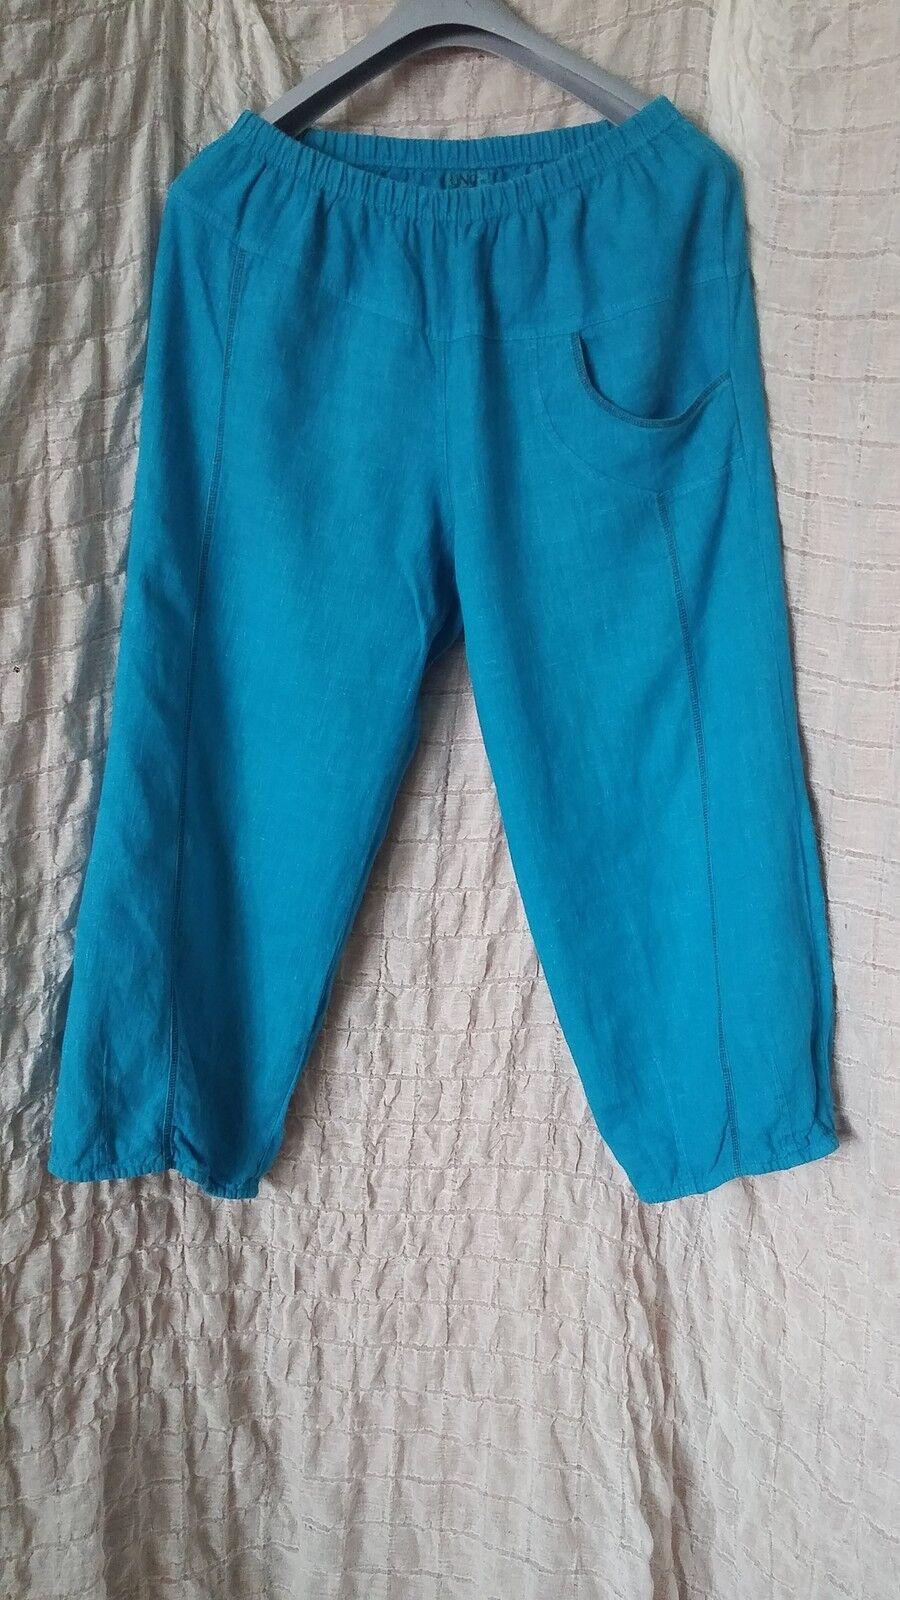 Uno Danmark turquoise bluee 100% linen baggy wide leg trousers size 2